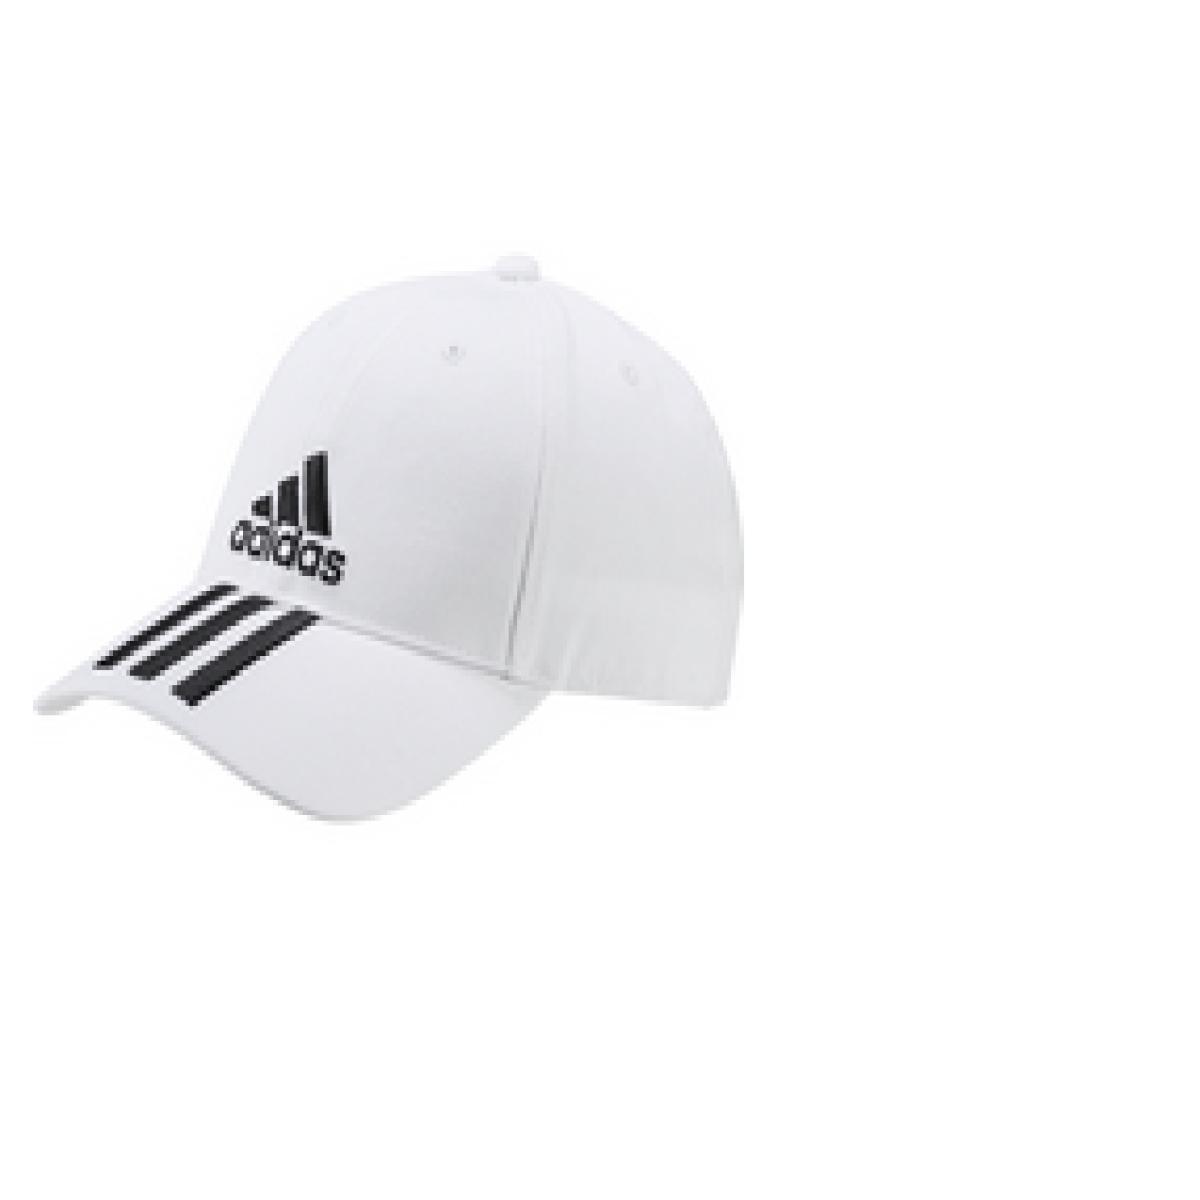 Masculino Adidas Du0197 Boné Ess 3s Cotton Branco